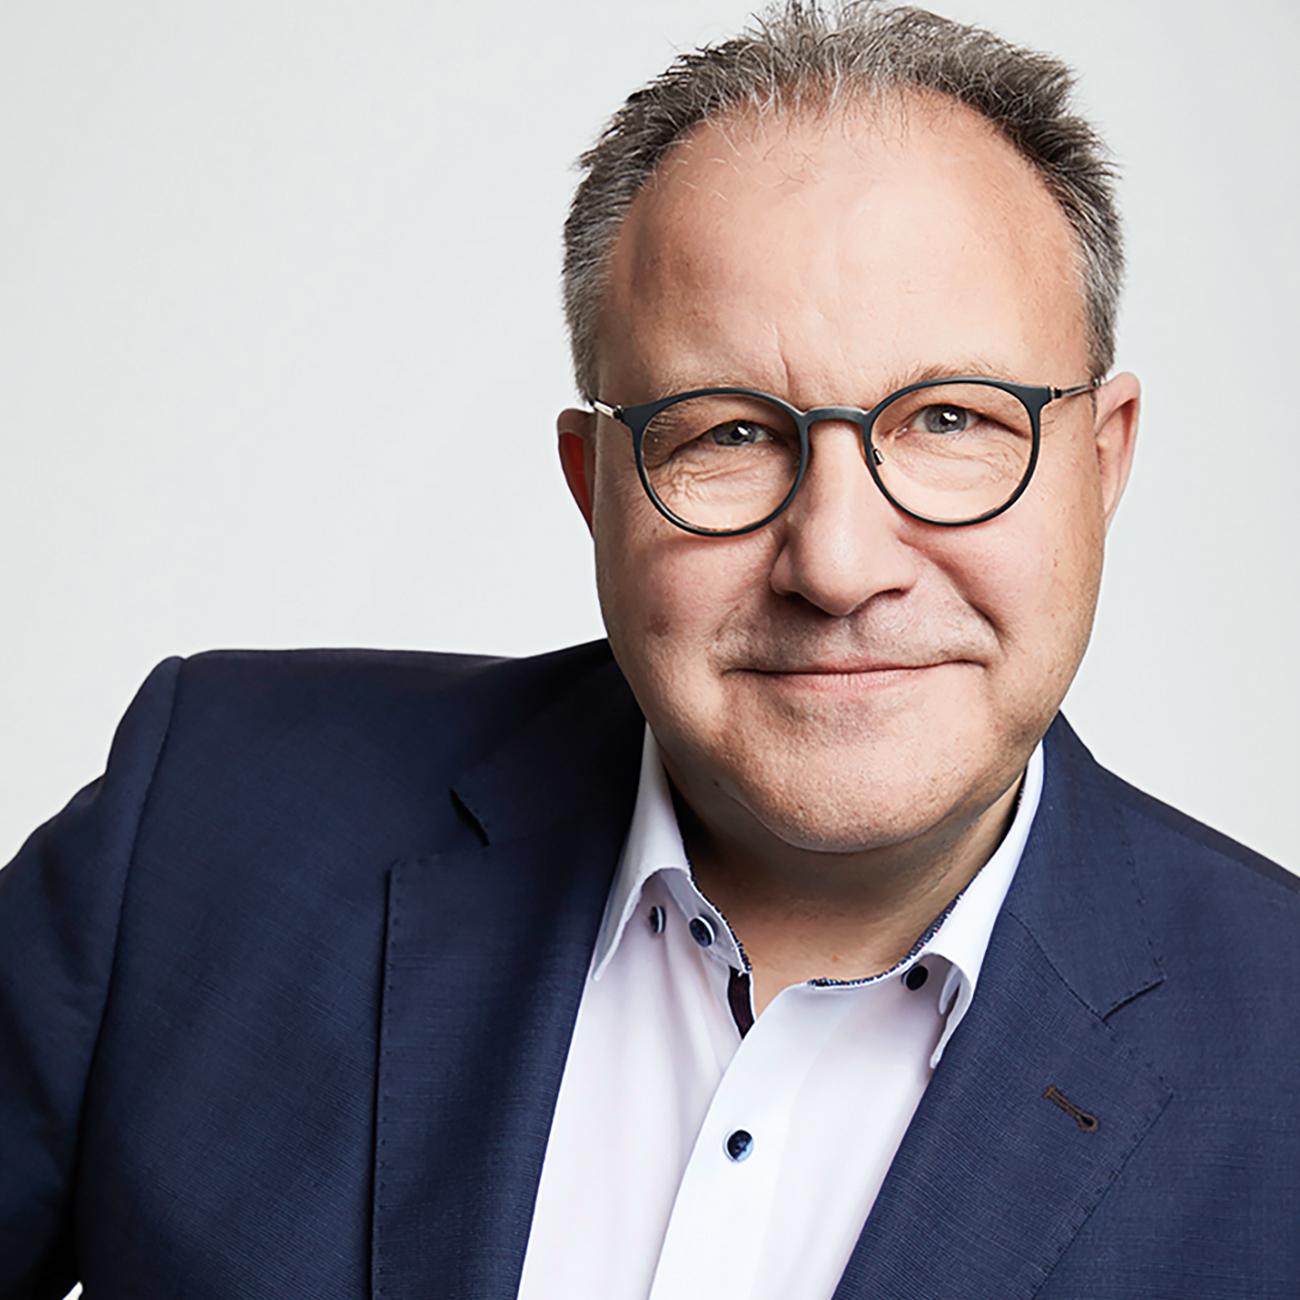 Prof. Dr. R. Horstmann